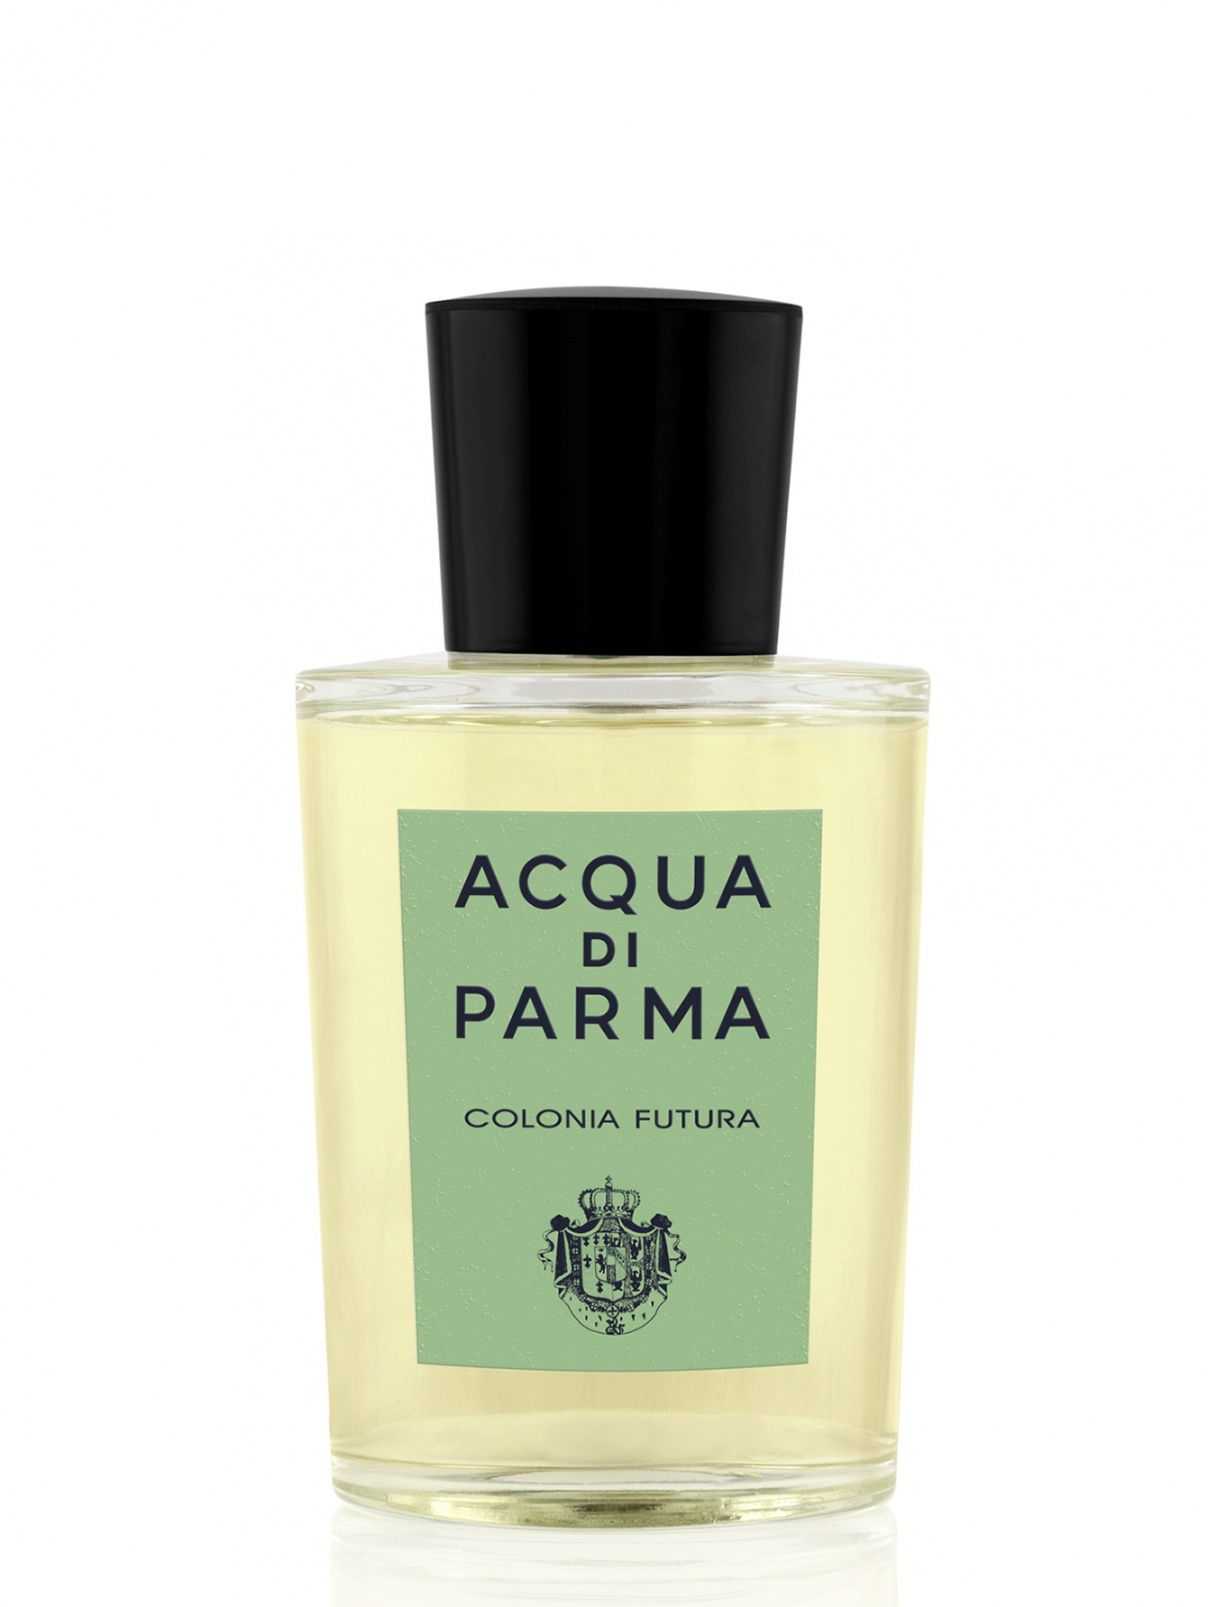 Одеколон Colonia Futura 50 мл Acqua di Parma  –  Общий вид